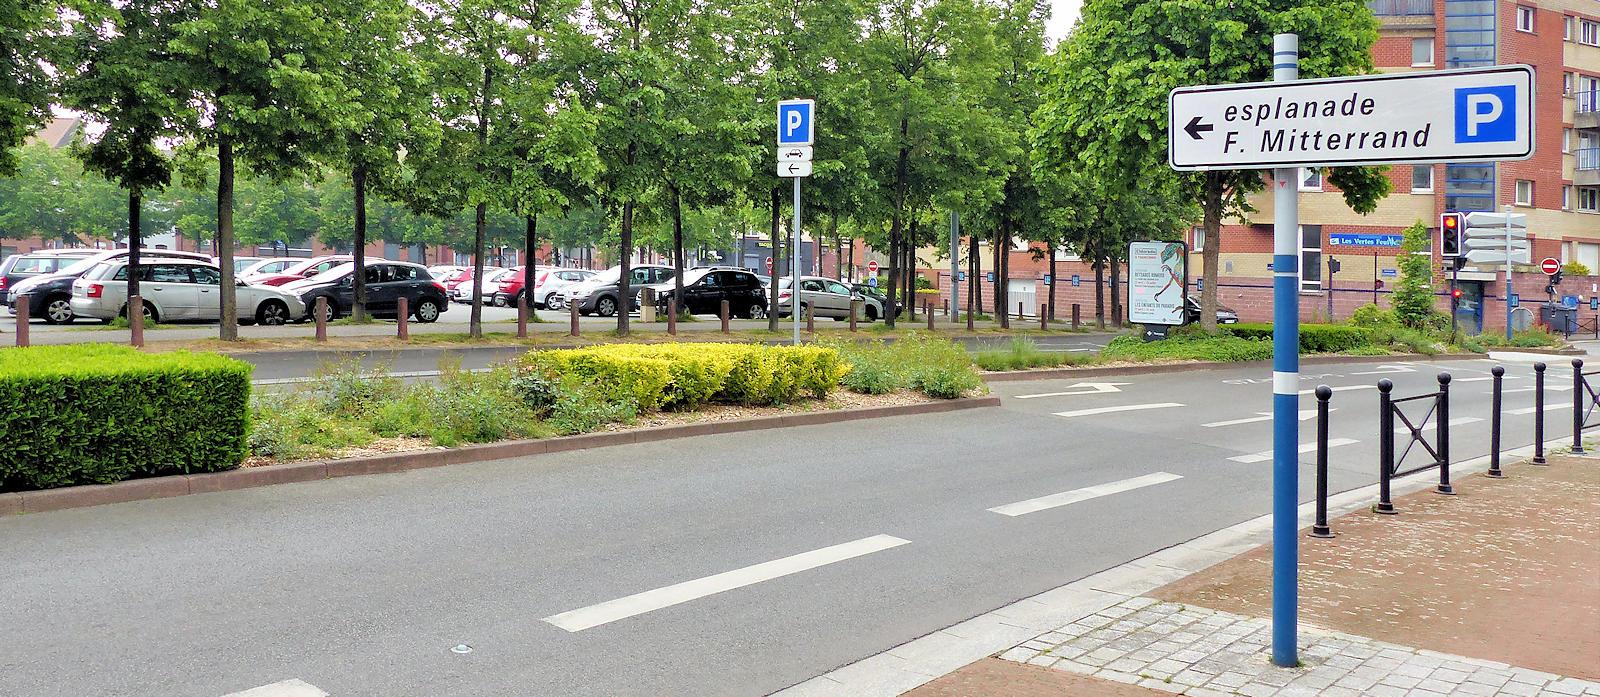 Parkings Tourcoing - Esplanade François Mitterrand